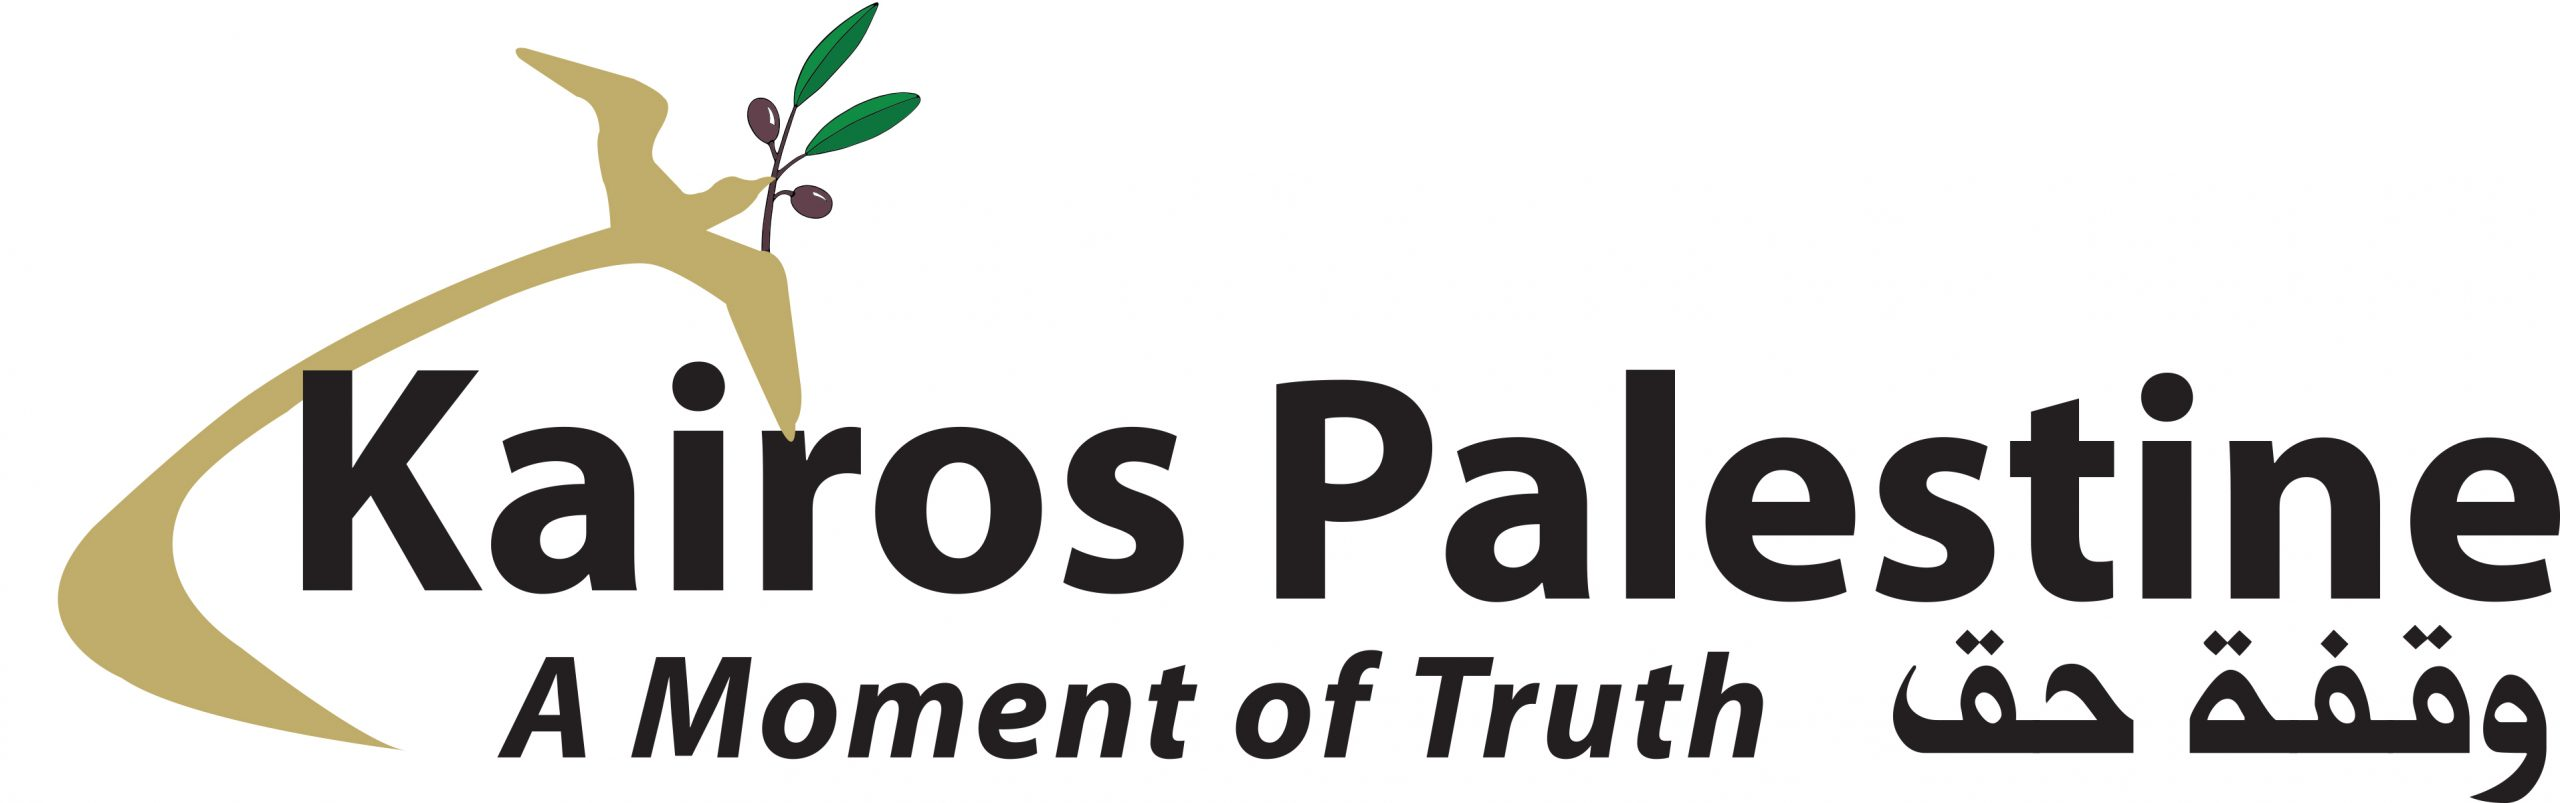 Kairos Palestine logo from GM website 2020